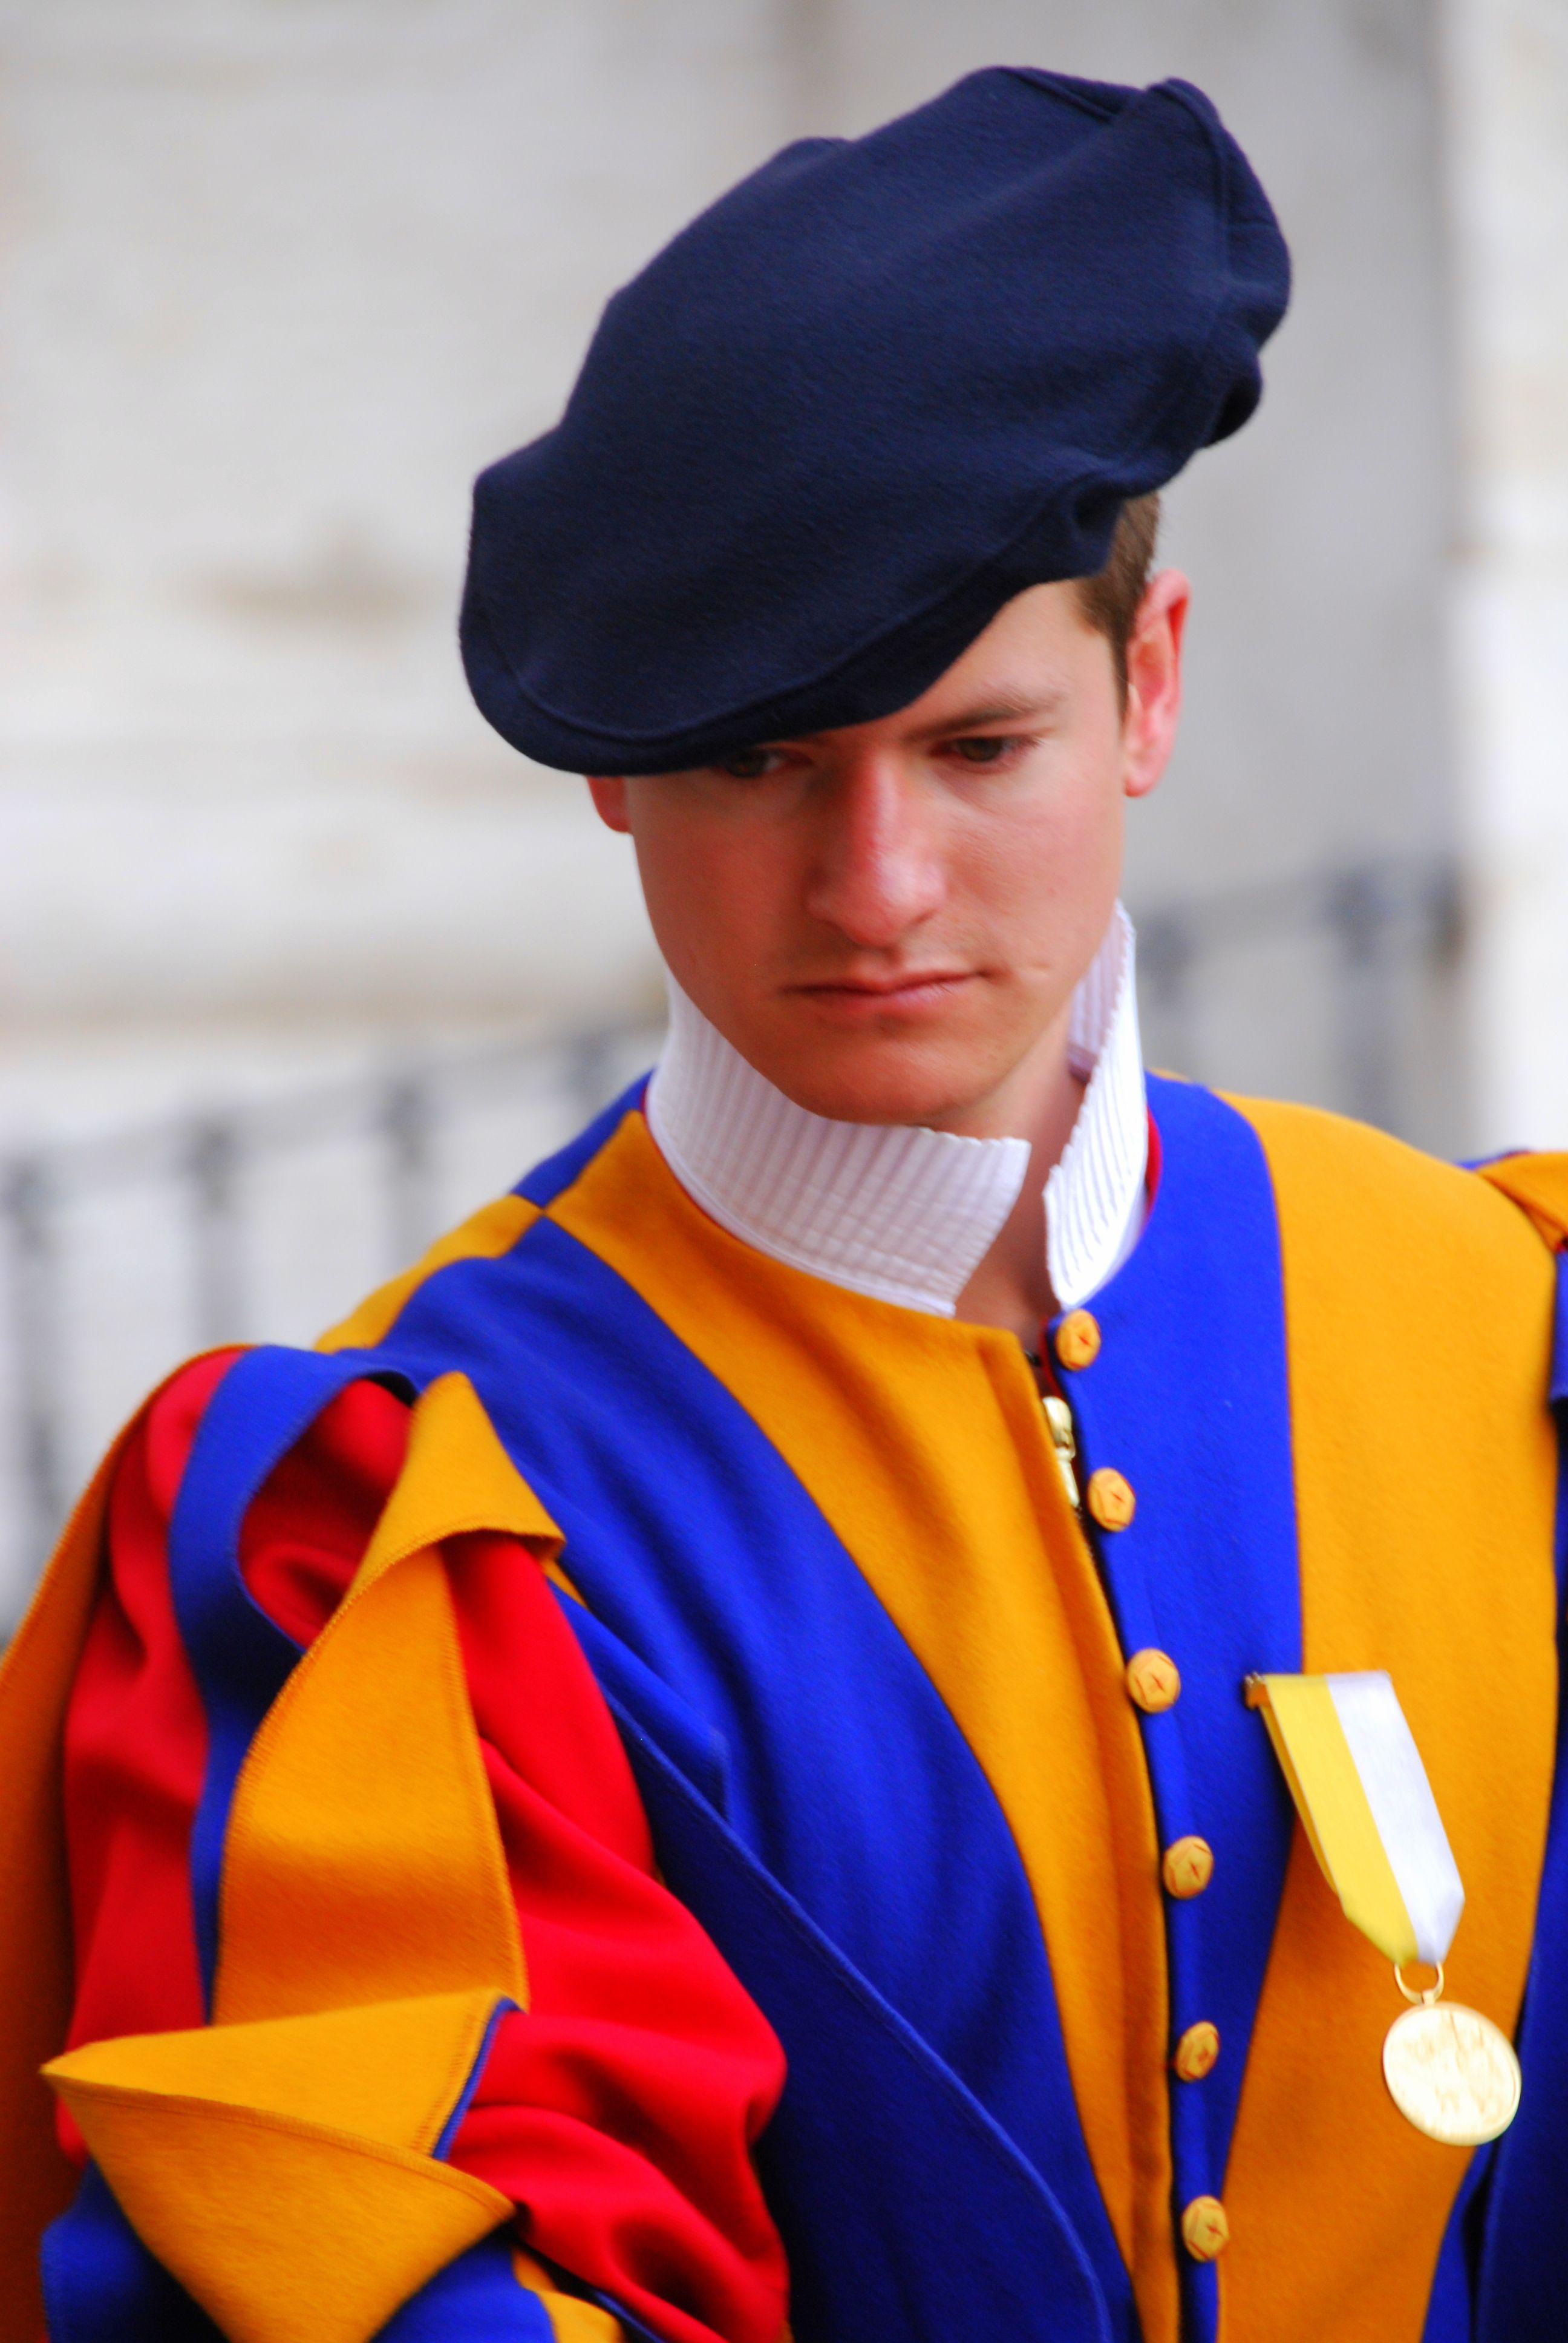 Swiss guard @ Vatican